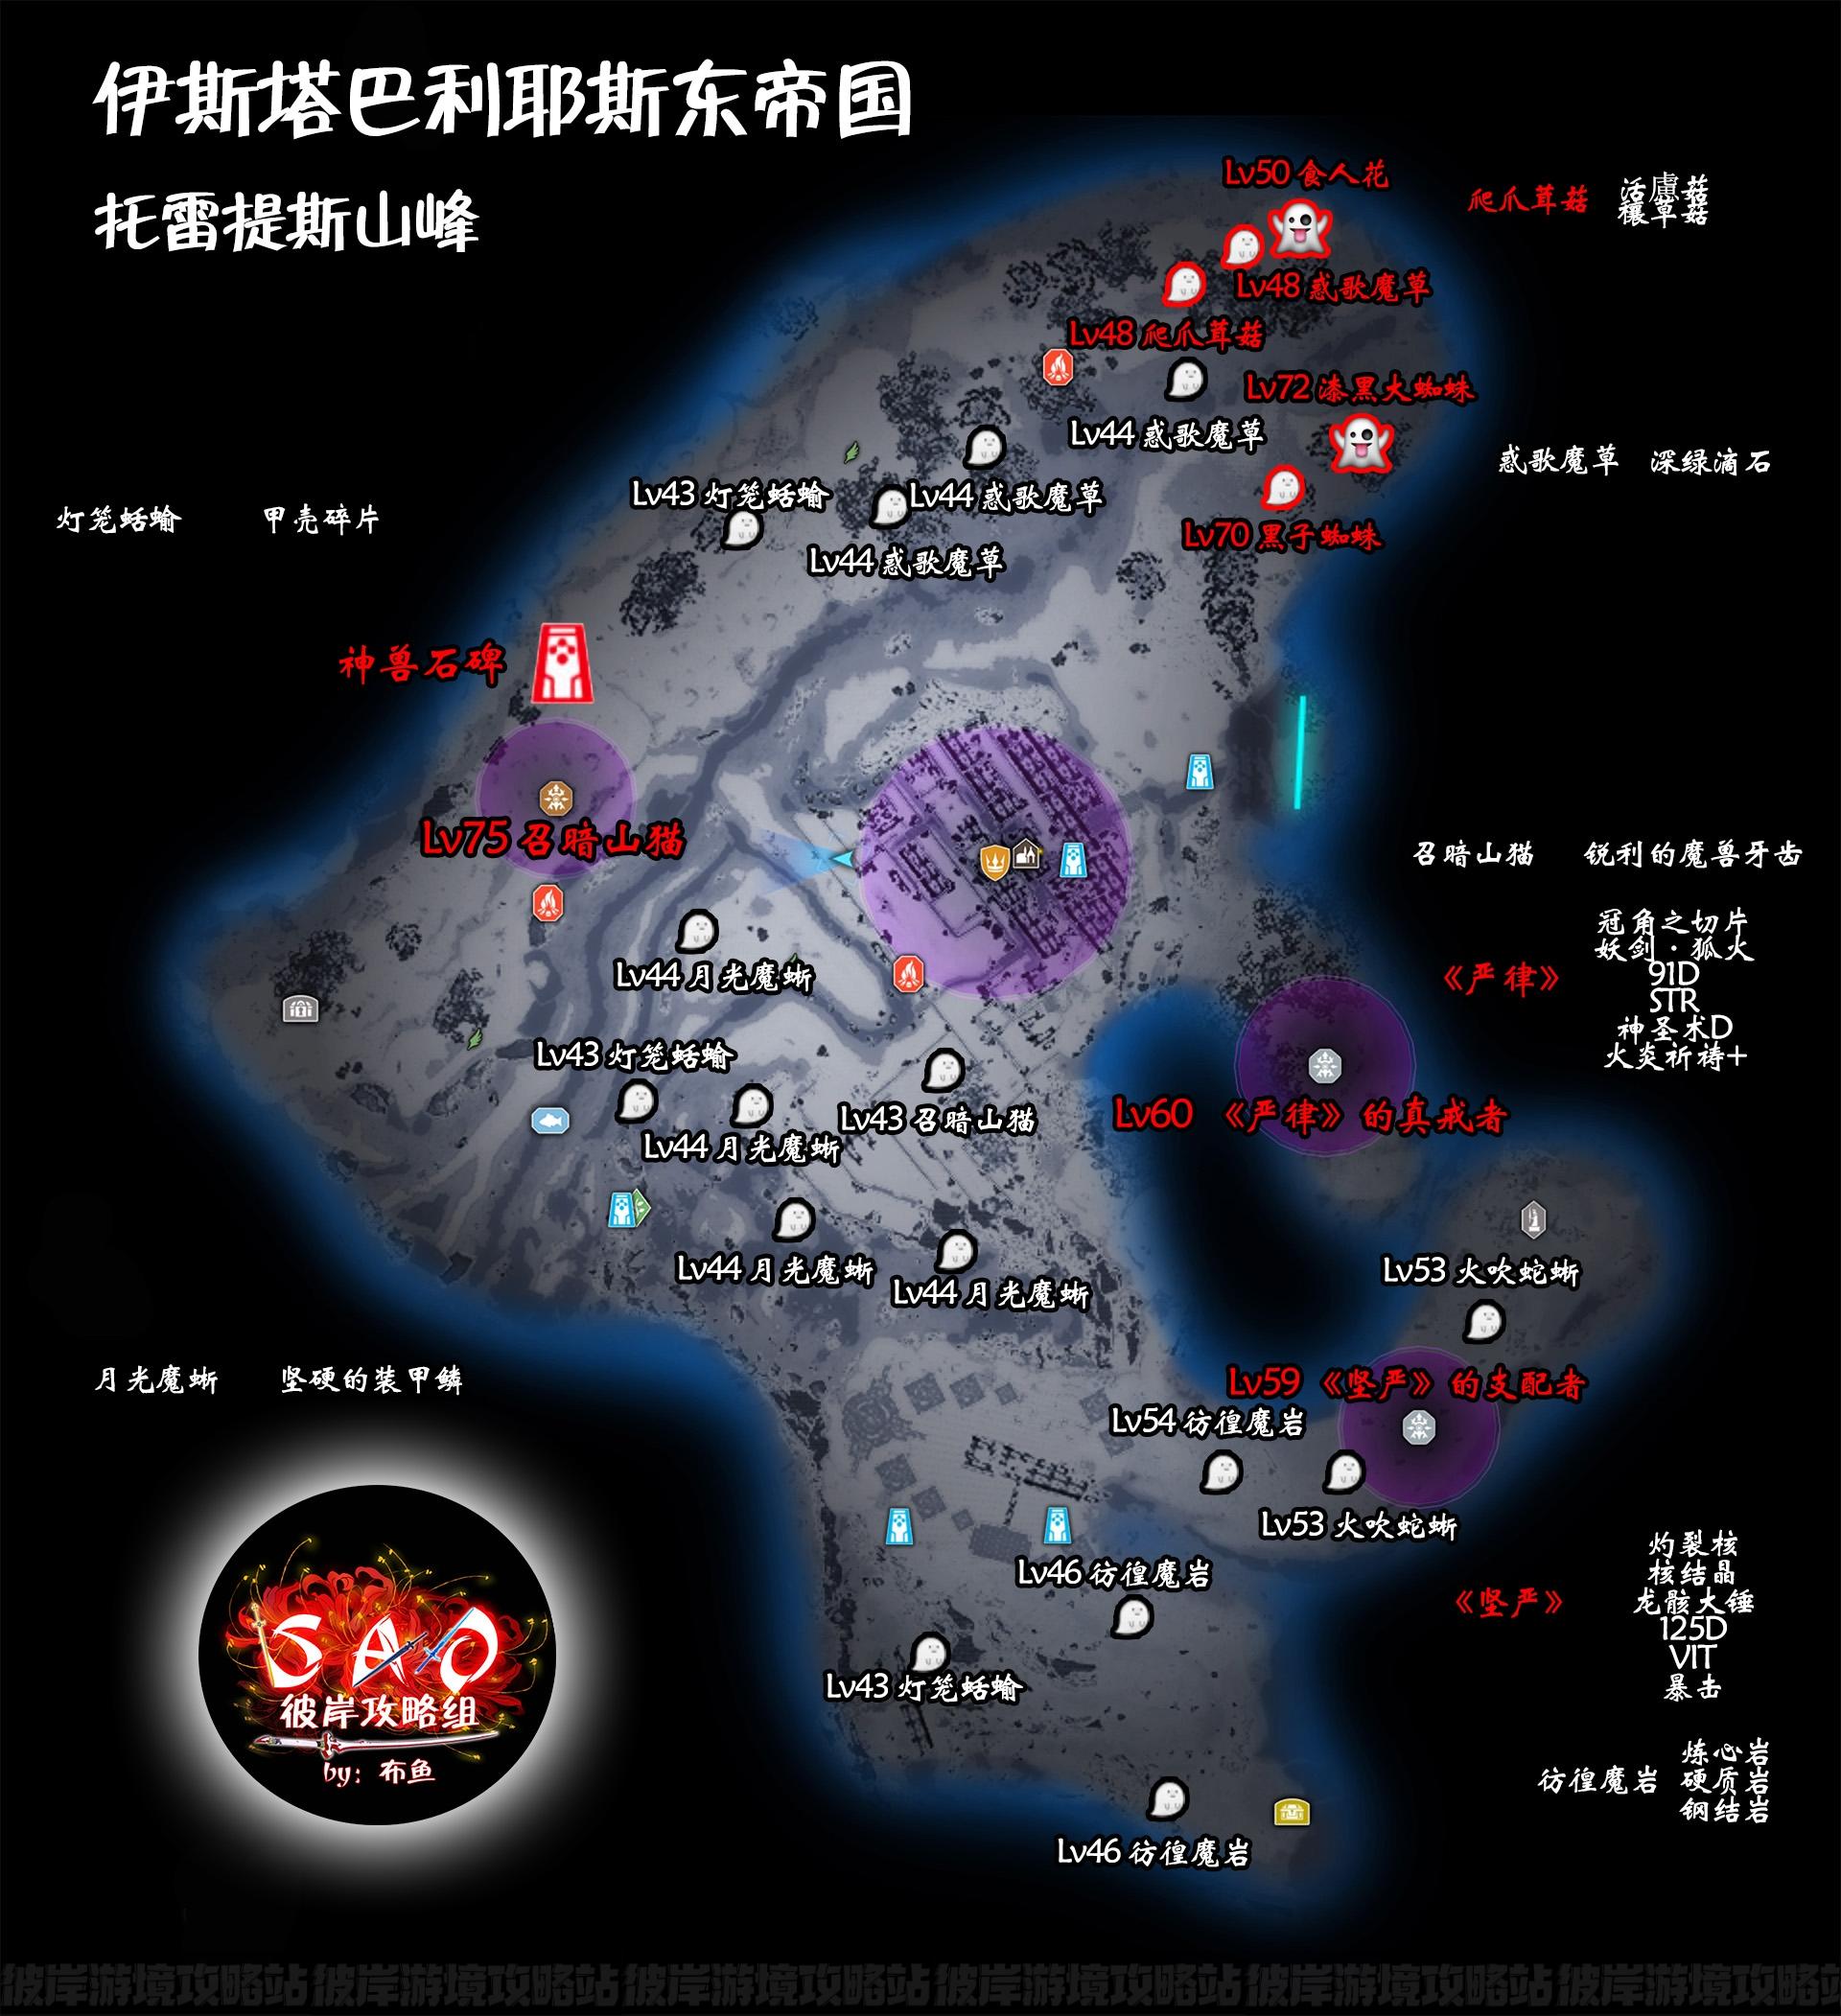 【SAOAL攻略组】超完全流程地图攻略及新手指引-托雷提斯山峰篇-刀剑神域彼岸游境攻略站